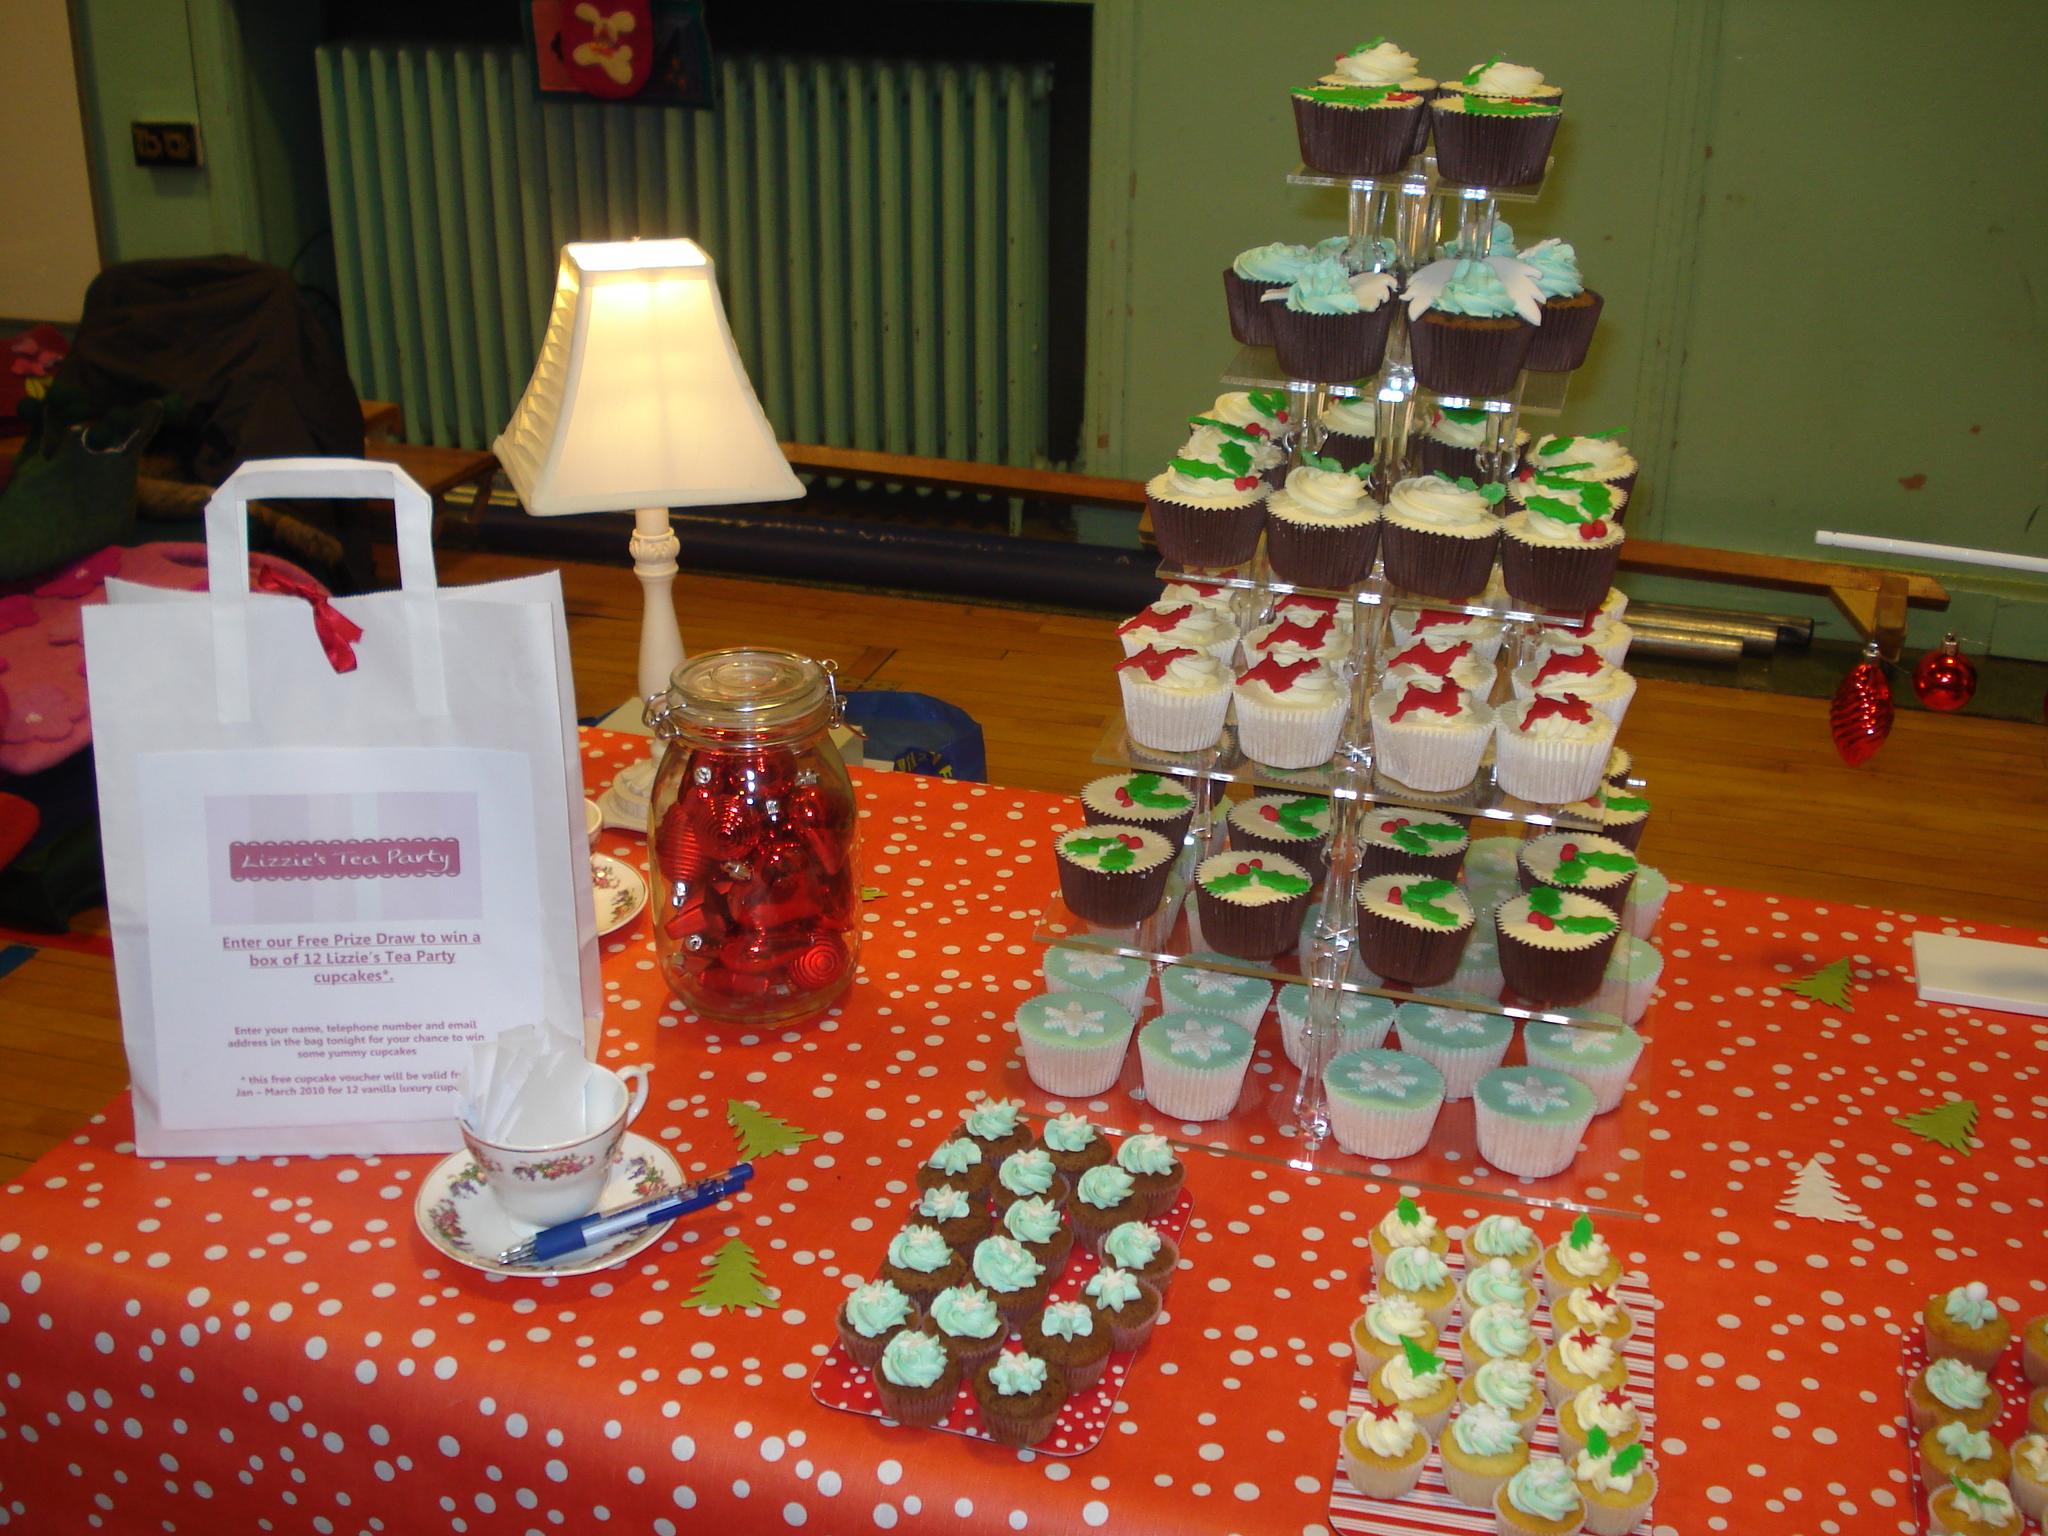 Christmas cupcakes, large and mini